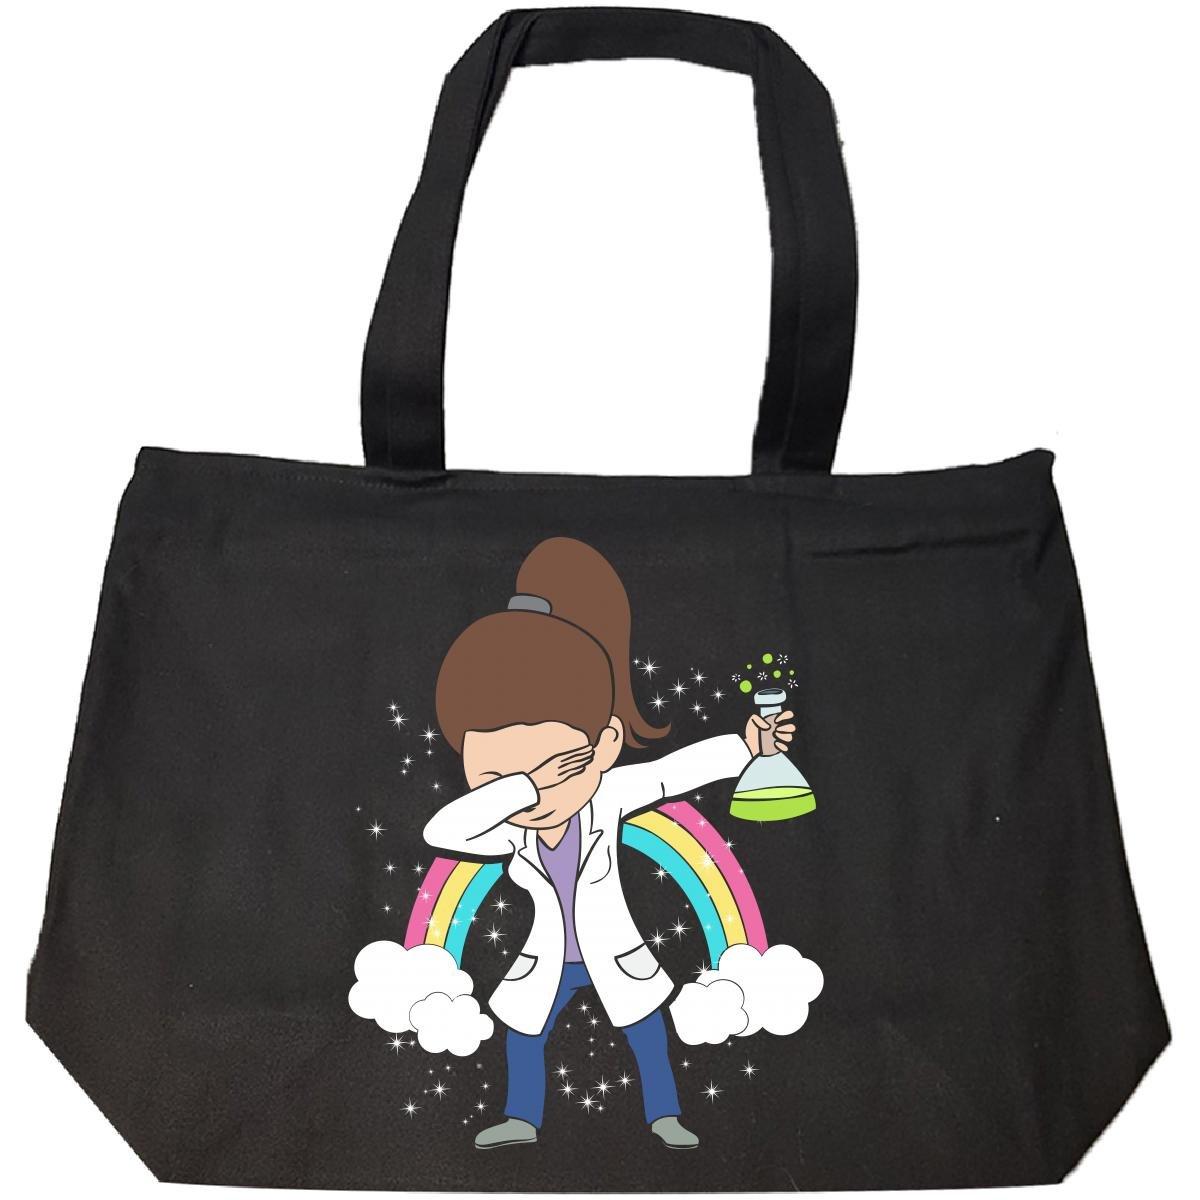 Dabbing Mom Wearing Labcoat Scientist Brown Hair Gift - Tote Bag With Zip